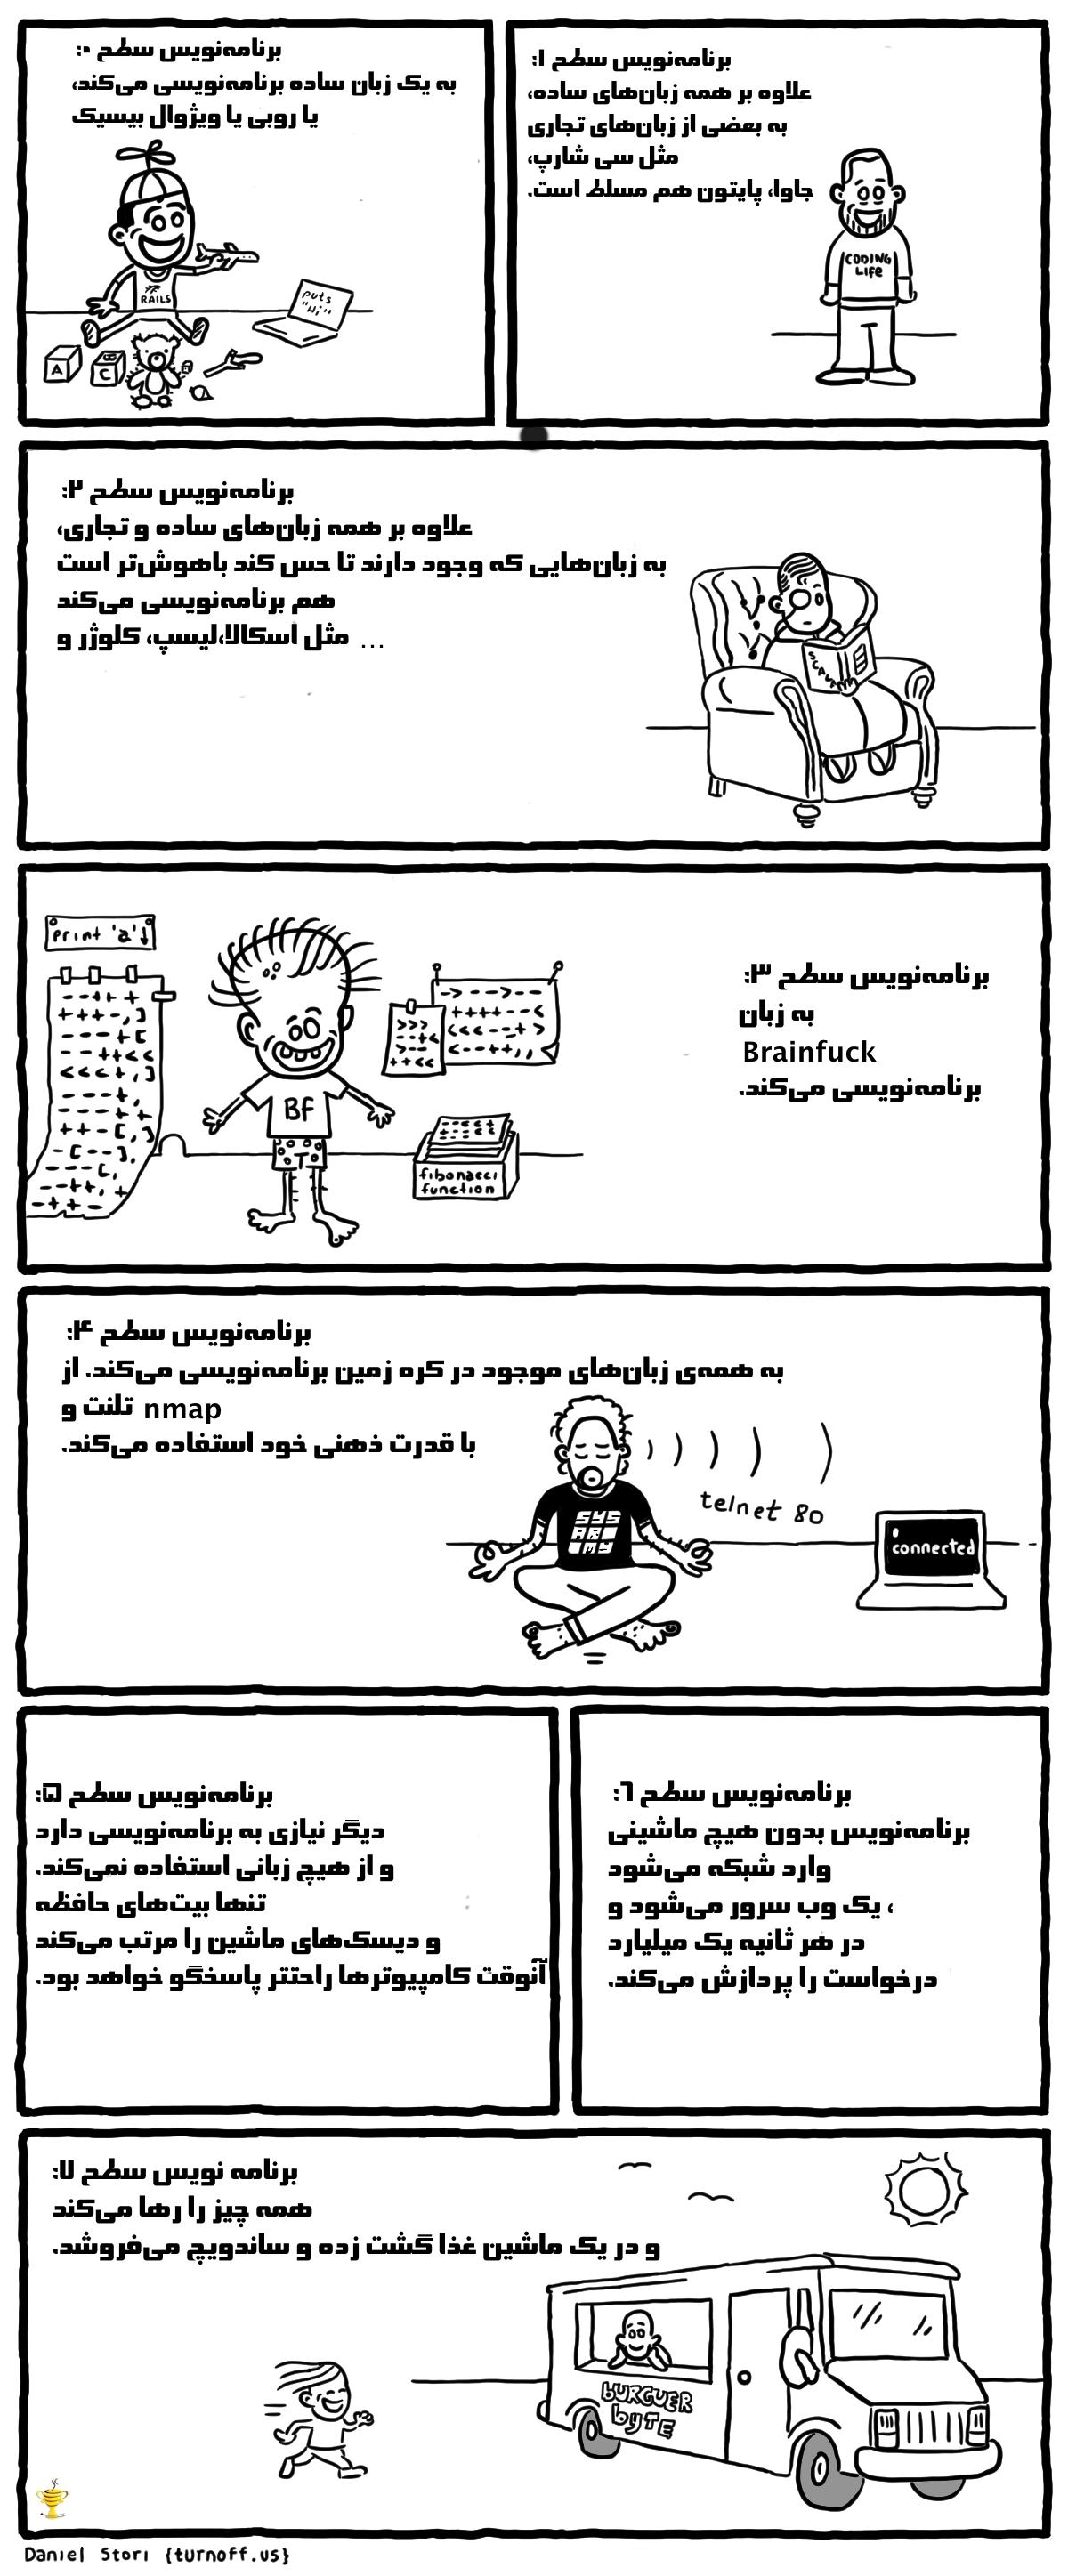 programmer-levels